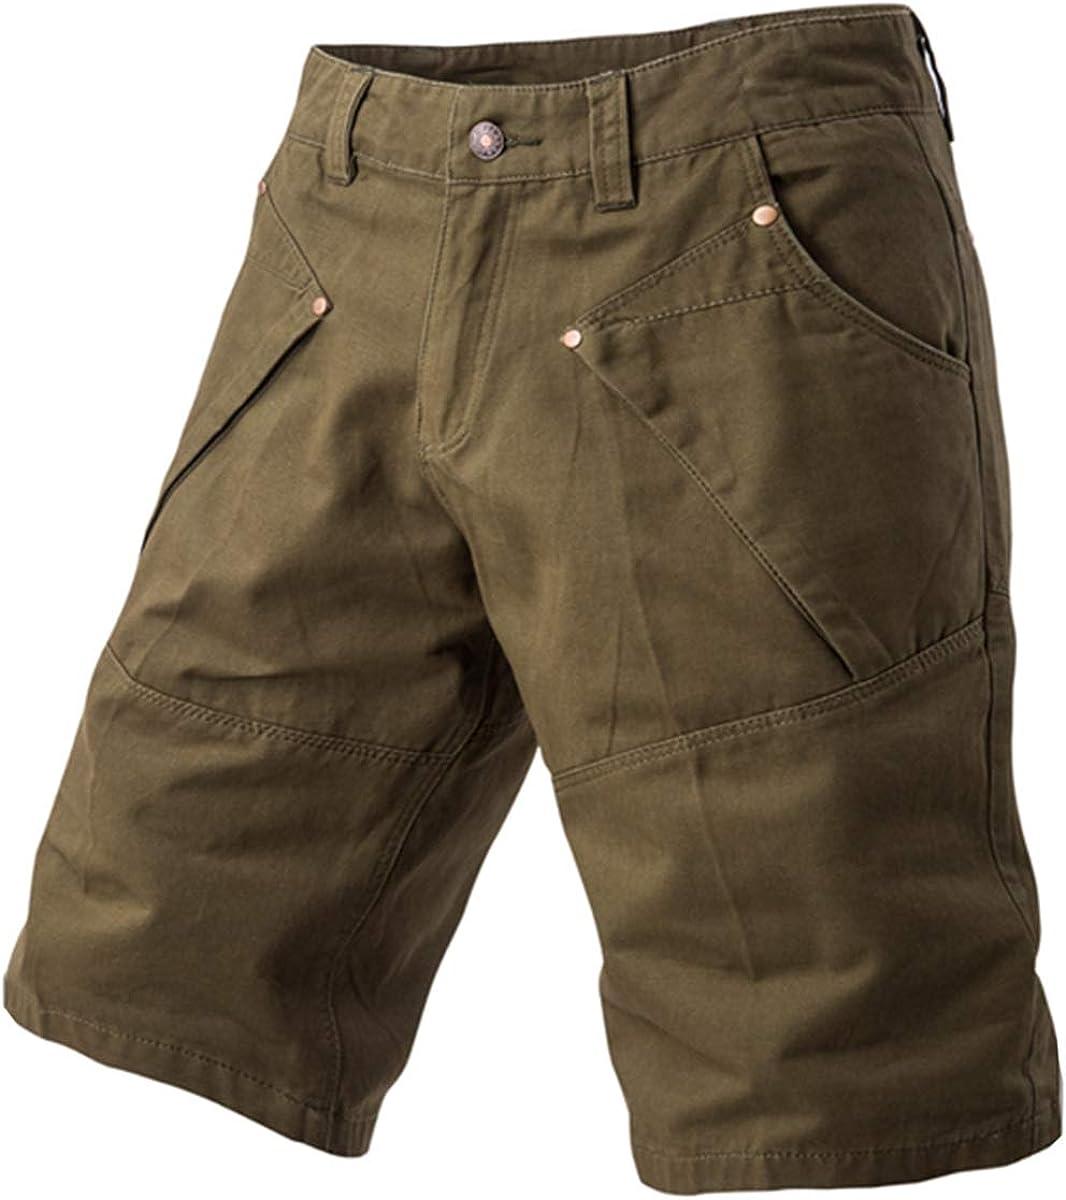 Wopop Mens Summer Outdoors Multi-Pocket Bermuda Ripstop Cargo Shorts